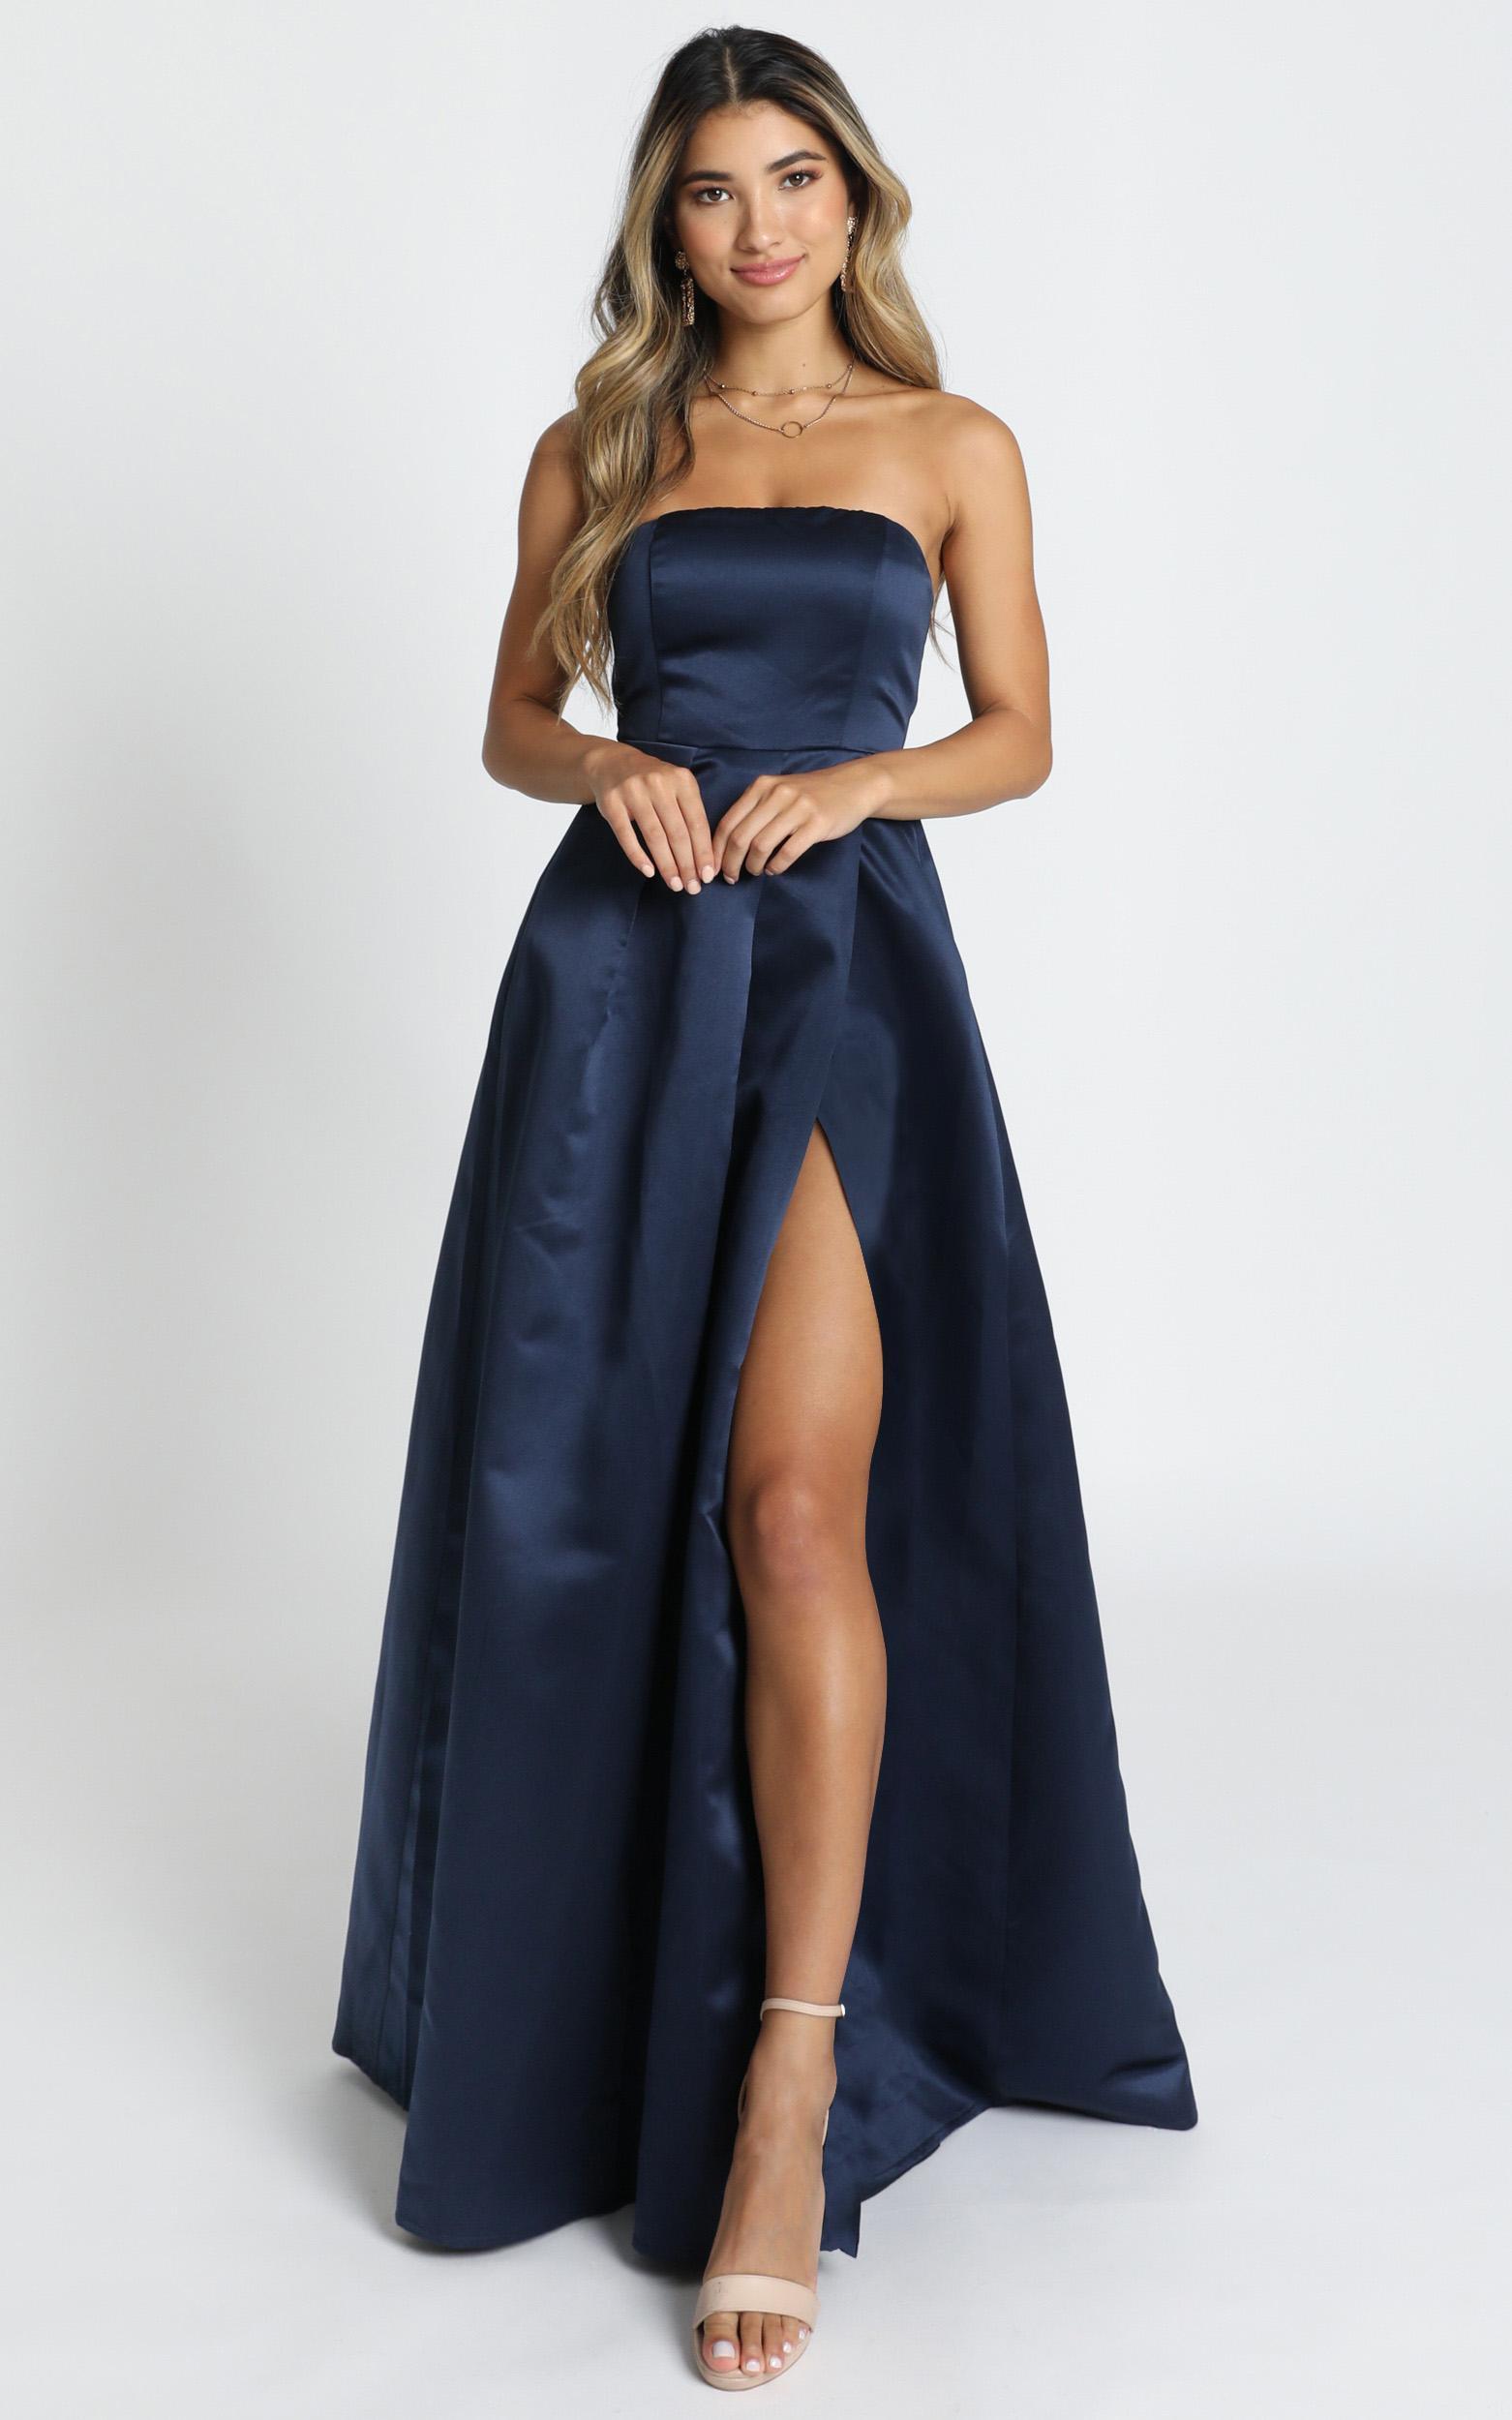 Queen Of The Show Dress In navy satin - 20 (XXXXL), Navy, hi-res image number null